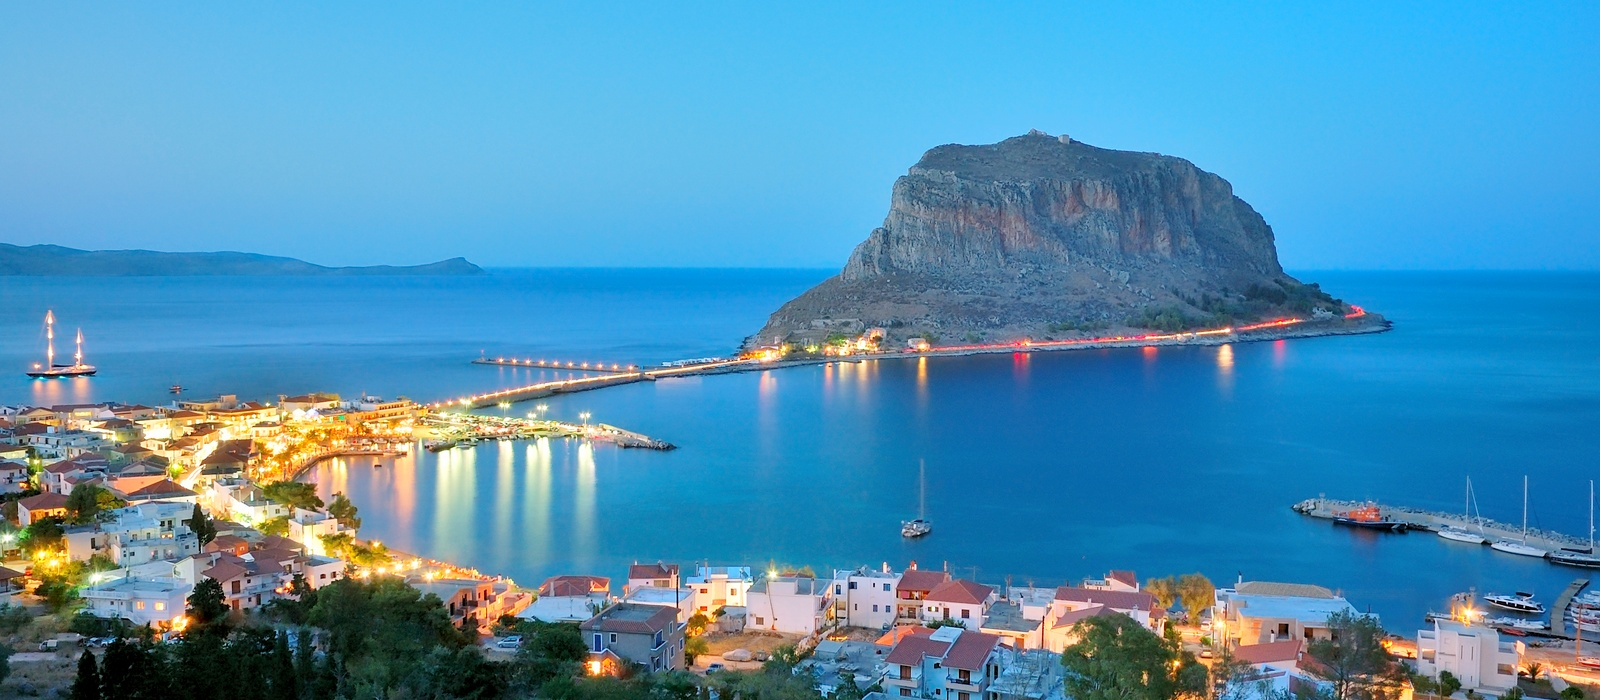 15 Top μονοήμερες εκδρομές στην Ελλάδα απο Καλαμάτα με το Trigilidas travel !! 1